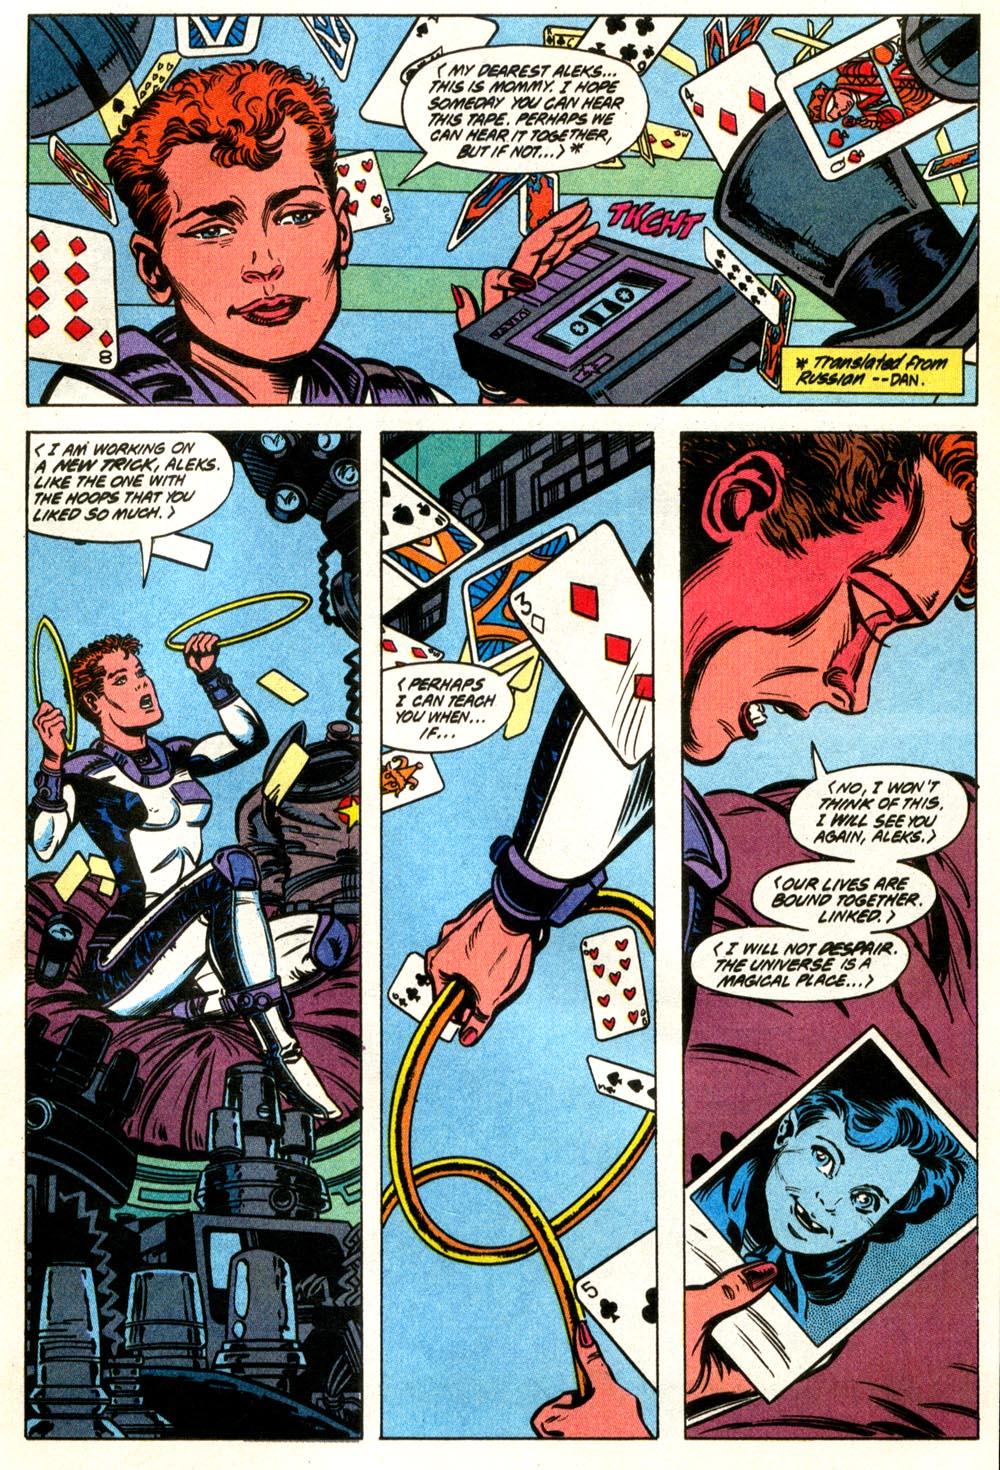 Read online Wonder Woman (1987) comic -  Issue #66 - 10